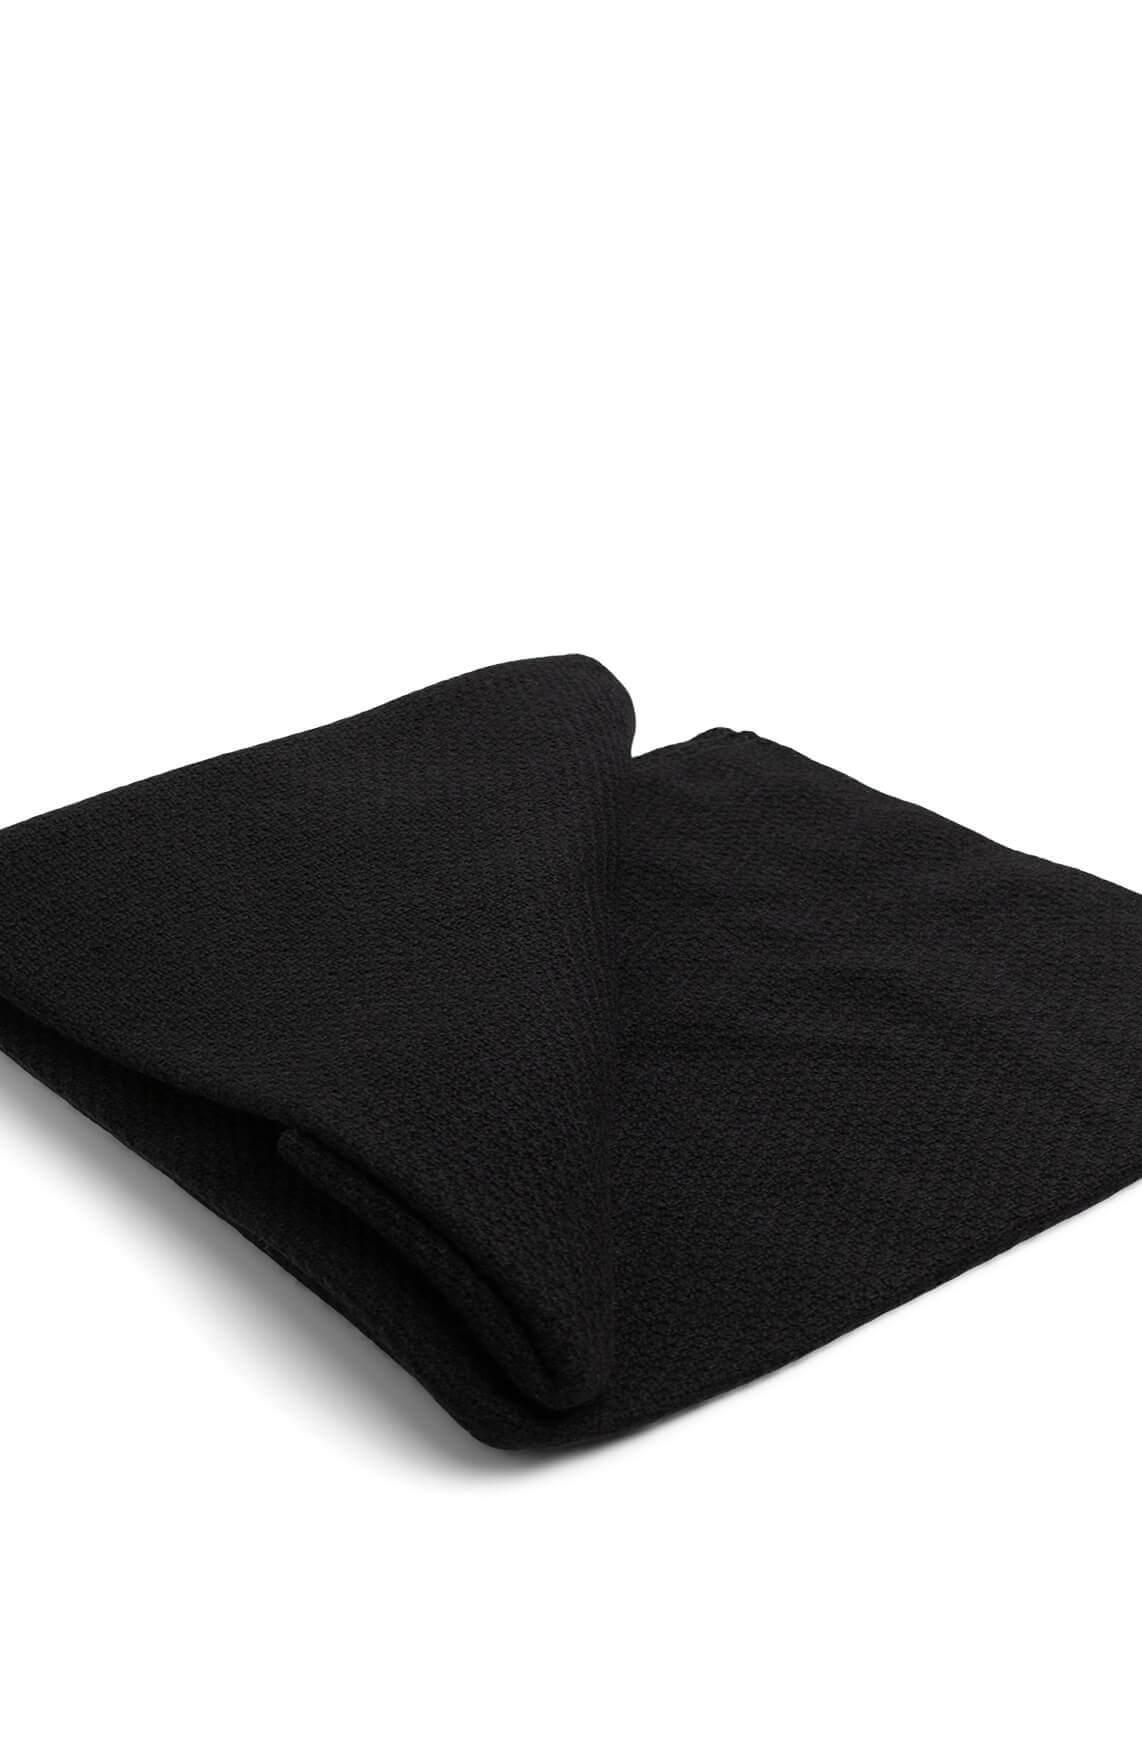 By Happy Sweater Dames Eva shawl zwart